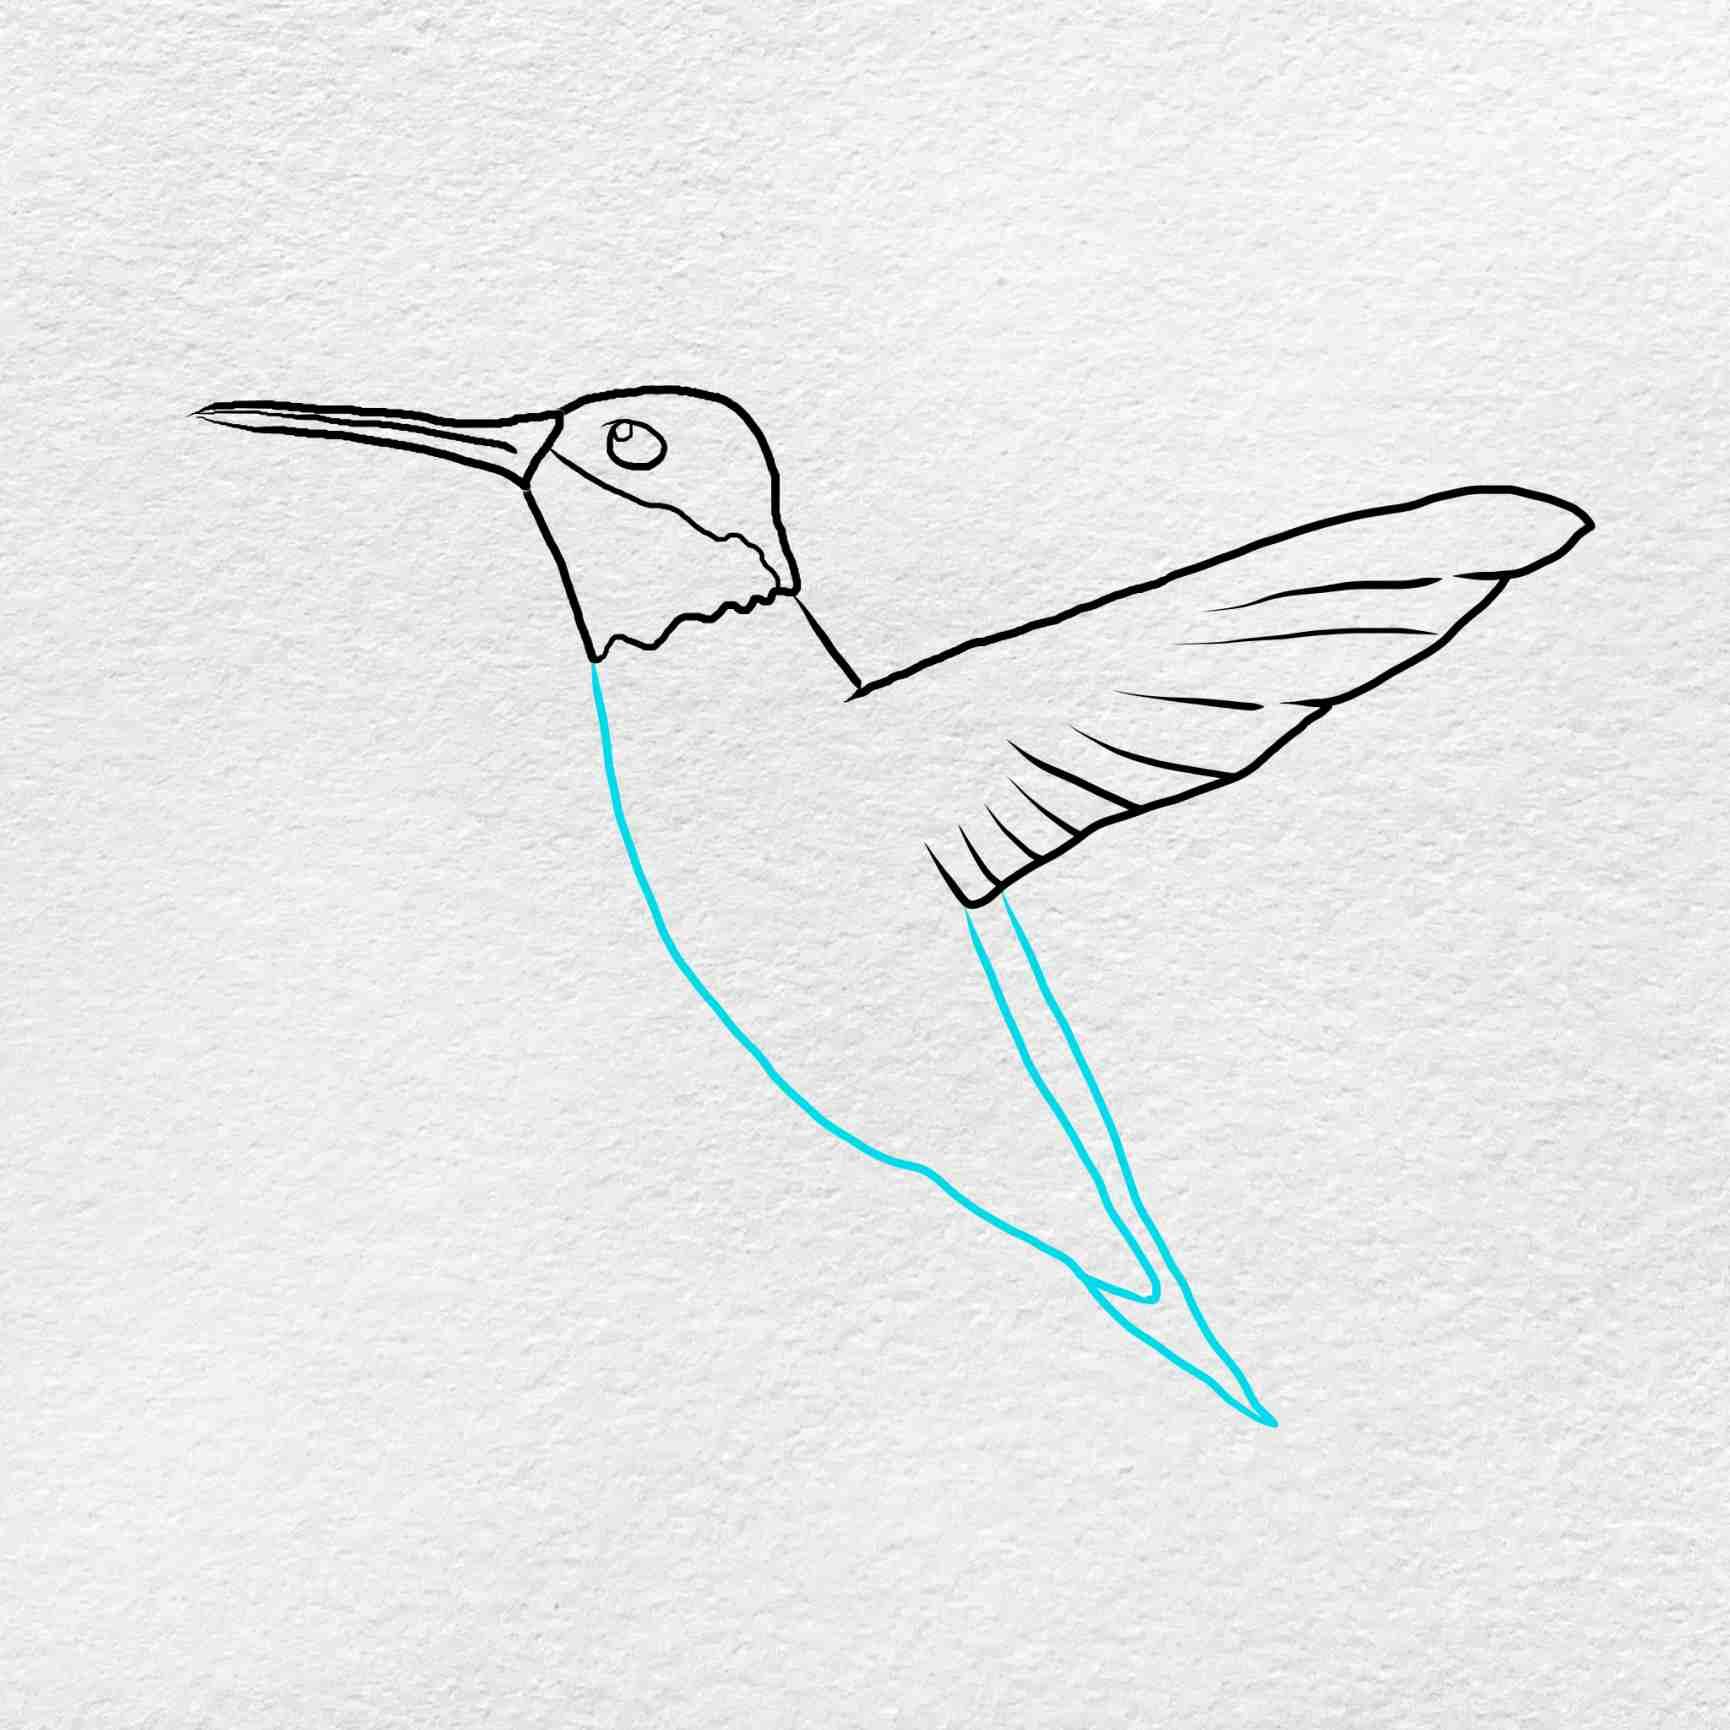 How To Draw Hummingbird: Step 4